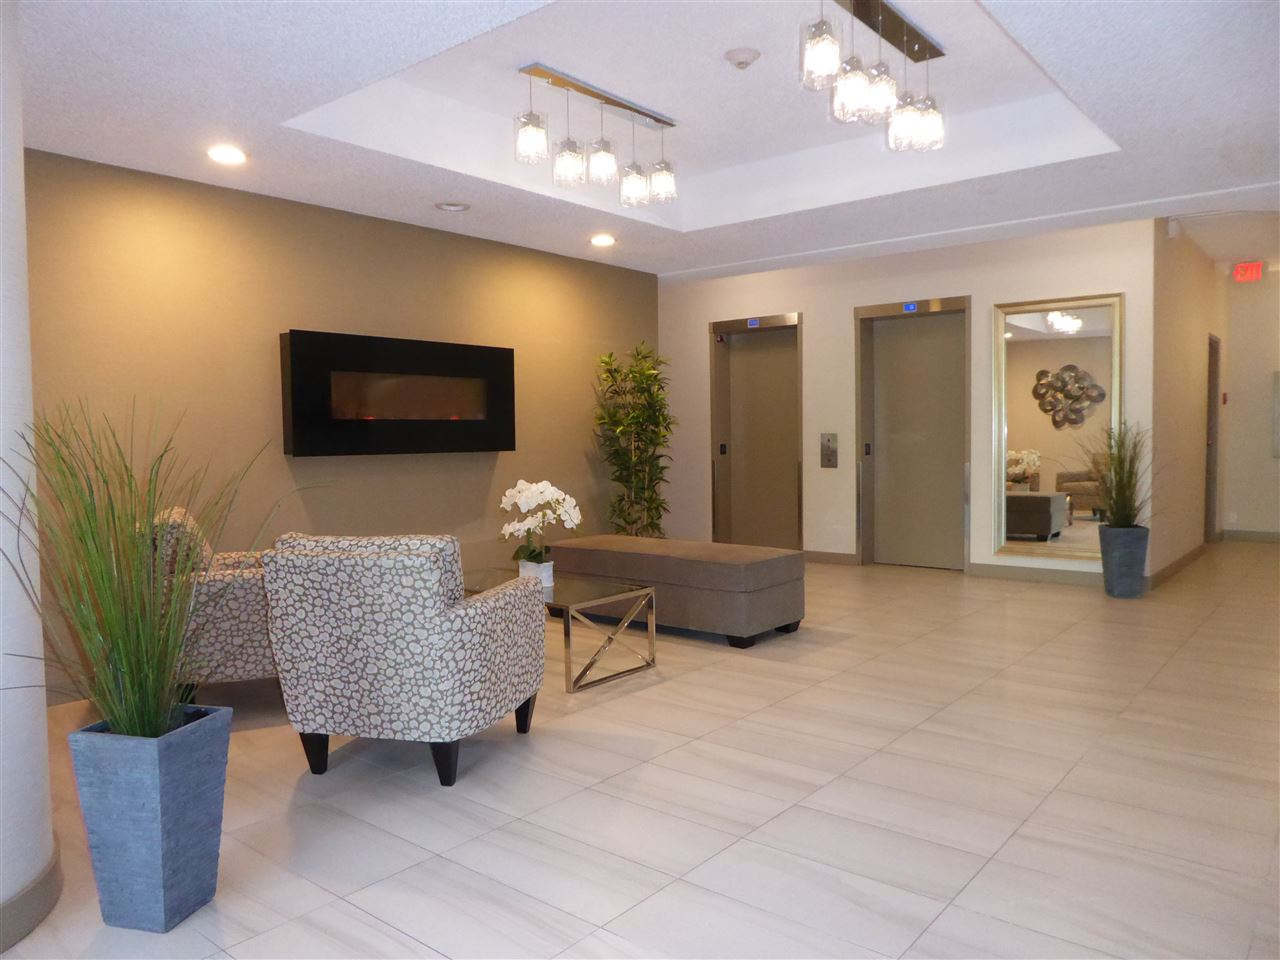 Condo Apartment at 1603 6282 KATHLEEN AVENUE, Unit 1603, Burnaby South, British Columbia. Image 4